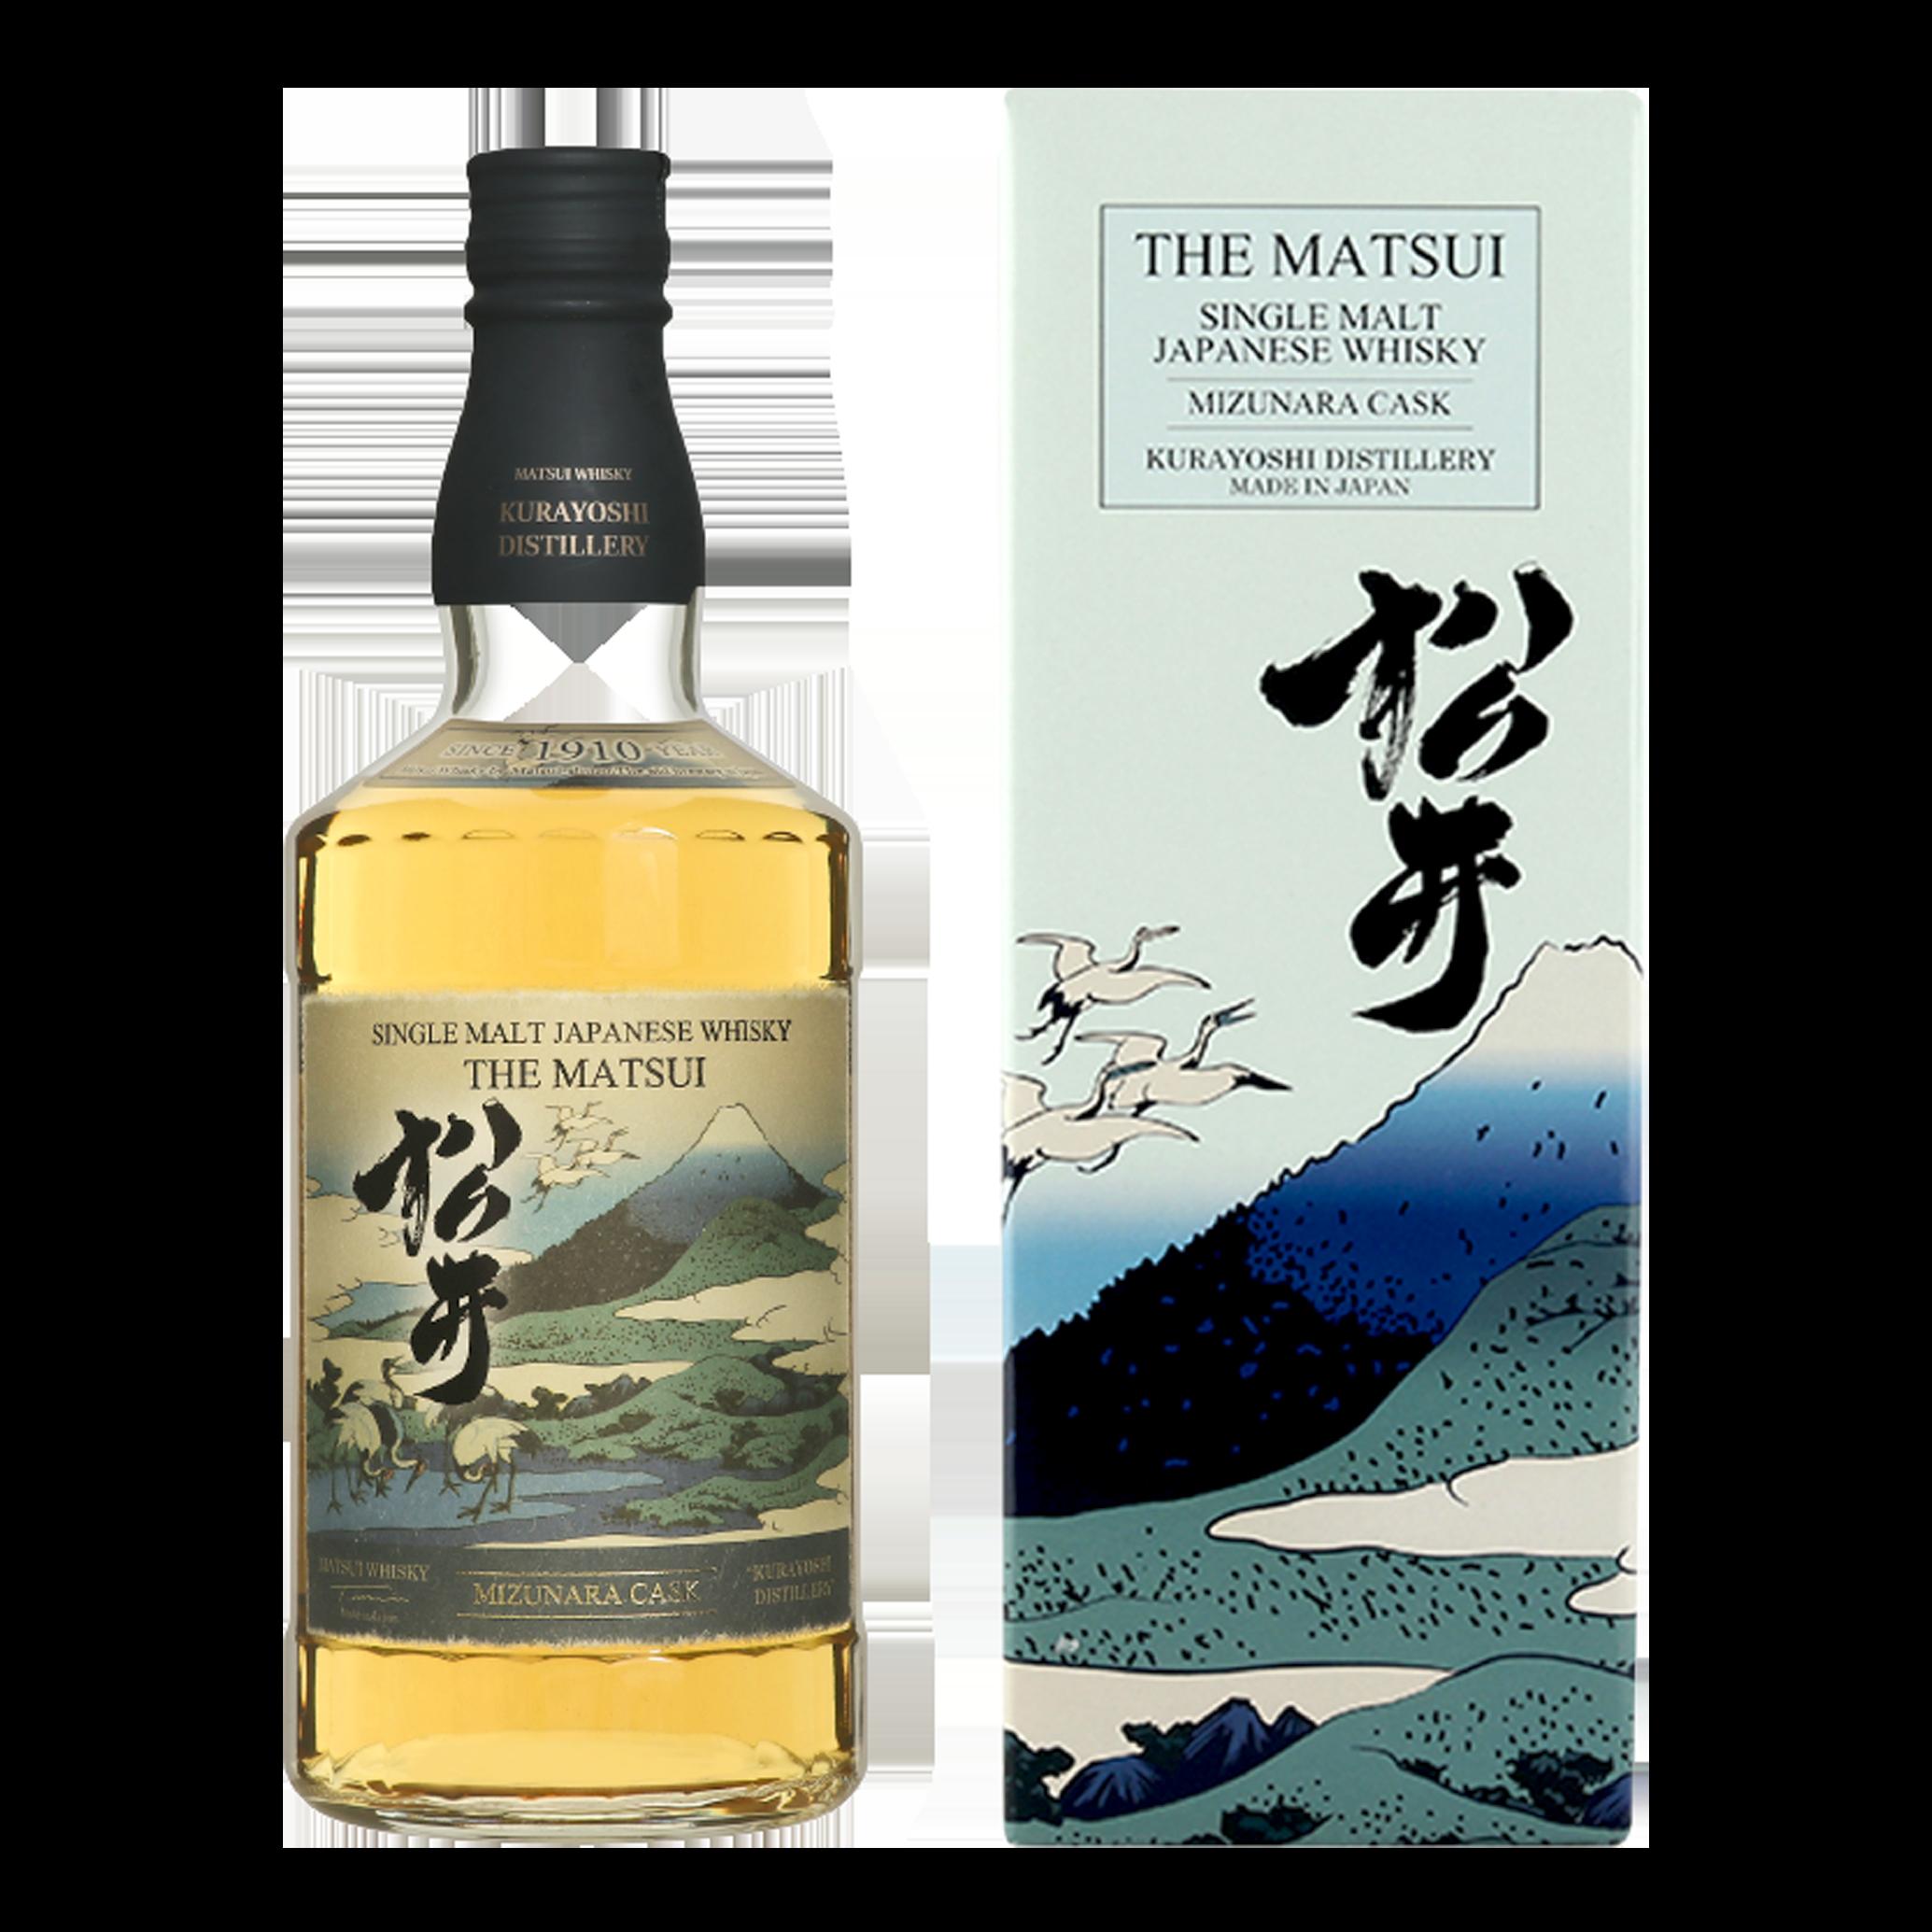 Whisky - The Matsui Mizunara Cask - Japon - 70cl - 48°